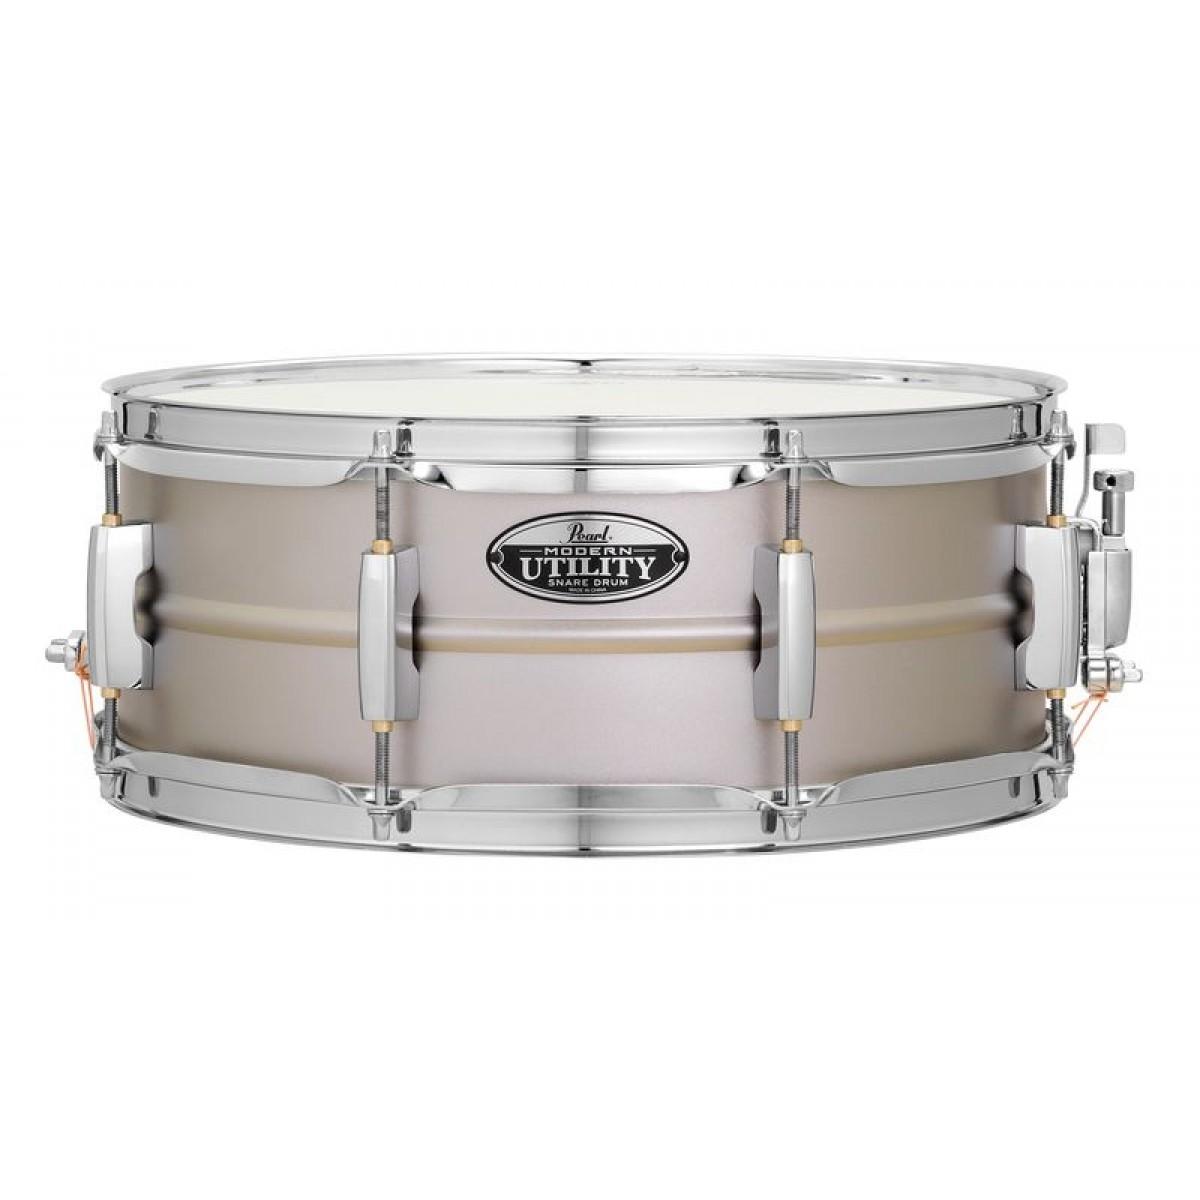 pearl modern utility snare drum 14 x5 5 steel. Black Bedroom Furniture Sets. Home Design Ideas